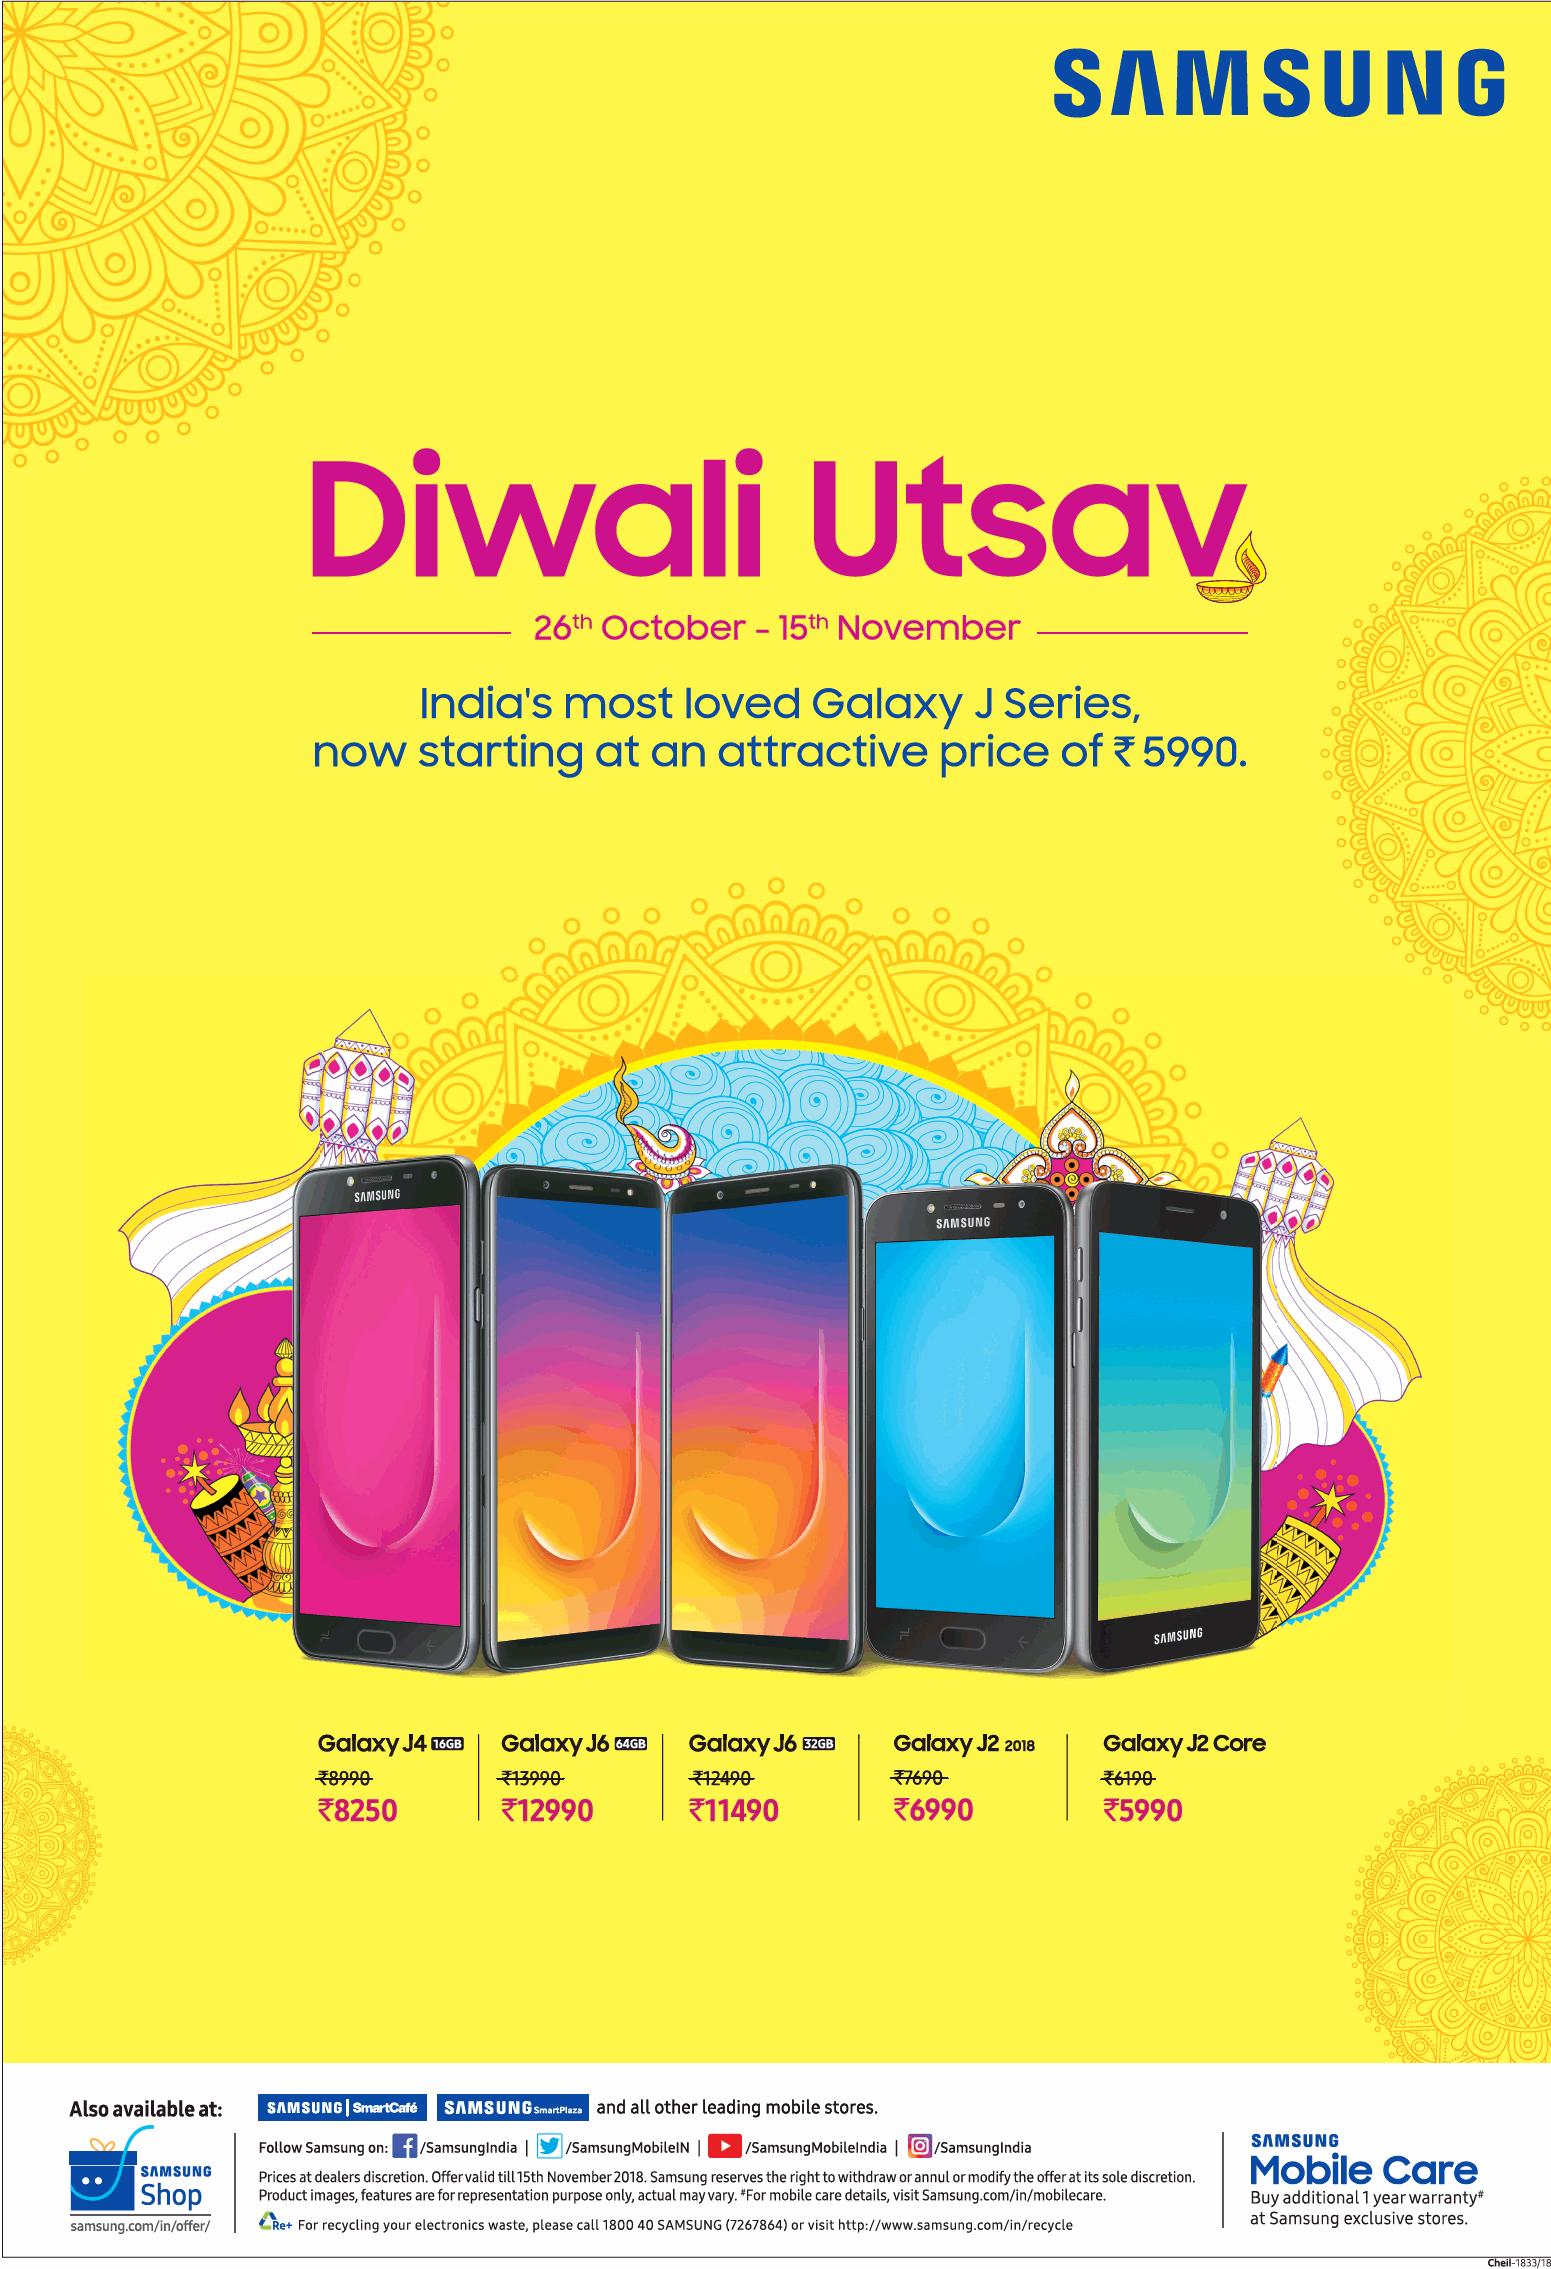 a0514107185 Samsung Diwali Utsav Ad - Advert Gallery